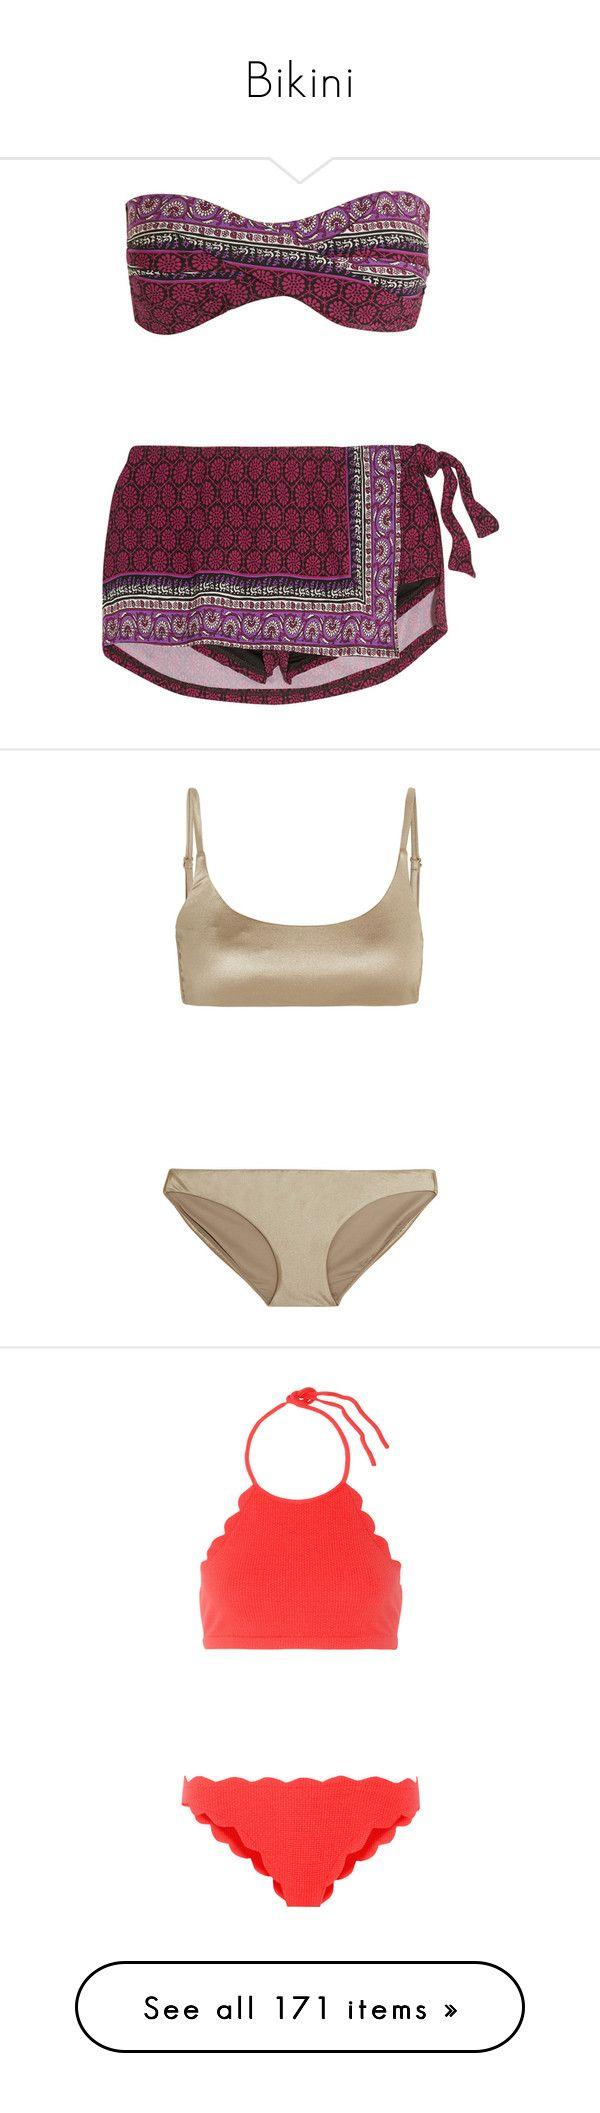 """Bikini"" by bliznec ❤ liked on Polyvore featuring swimwear, bikinis, 2 piece swimwear, bandeau swimwear, 2 piece bikini, colorful bikini, multicolor bikini, bronze, calvin klein and metallic swimwear"